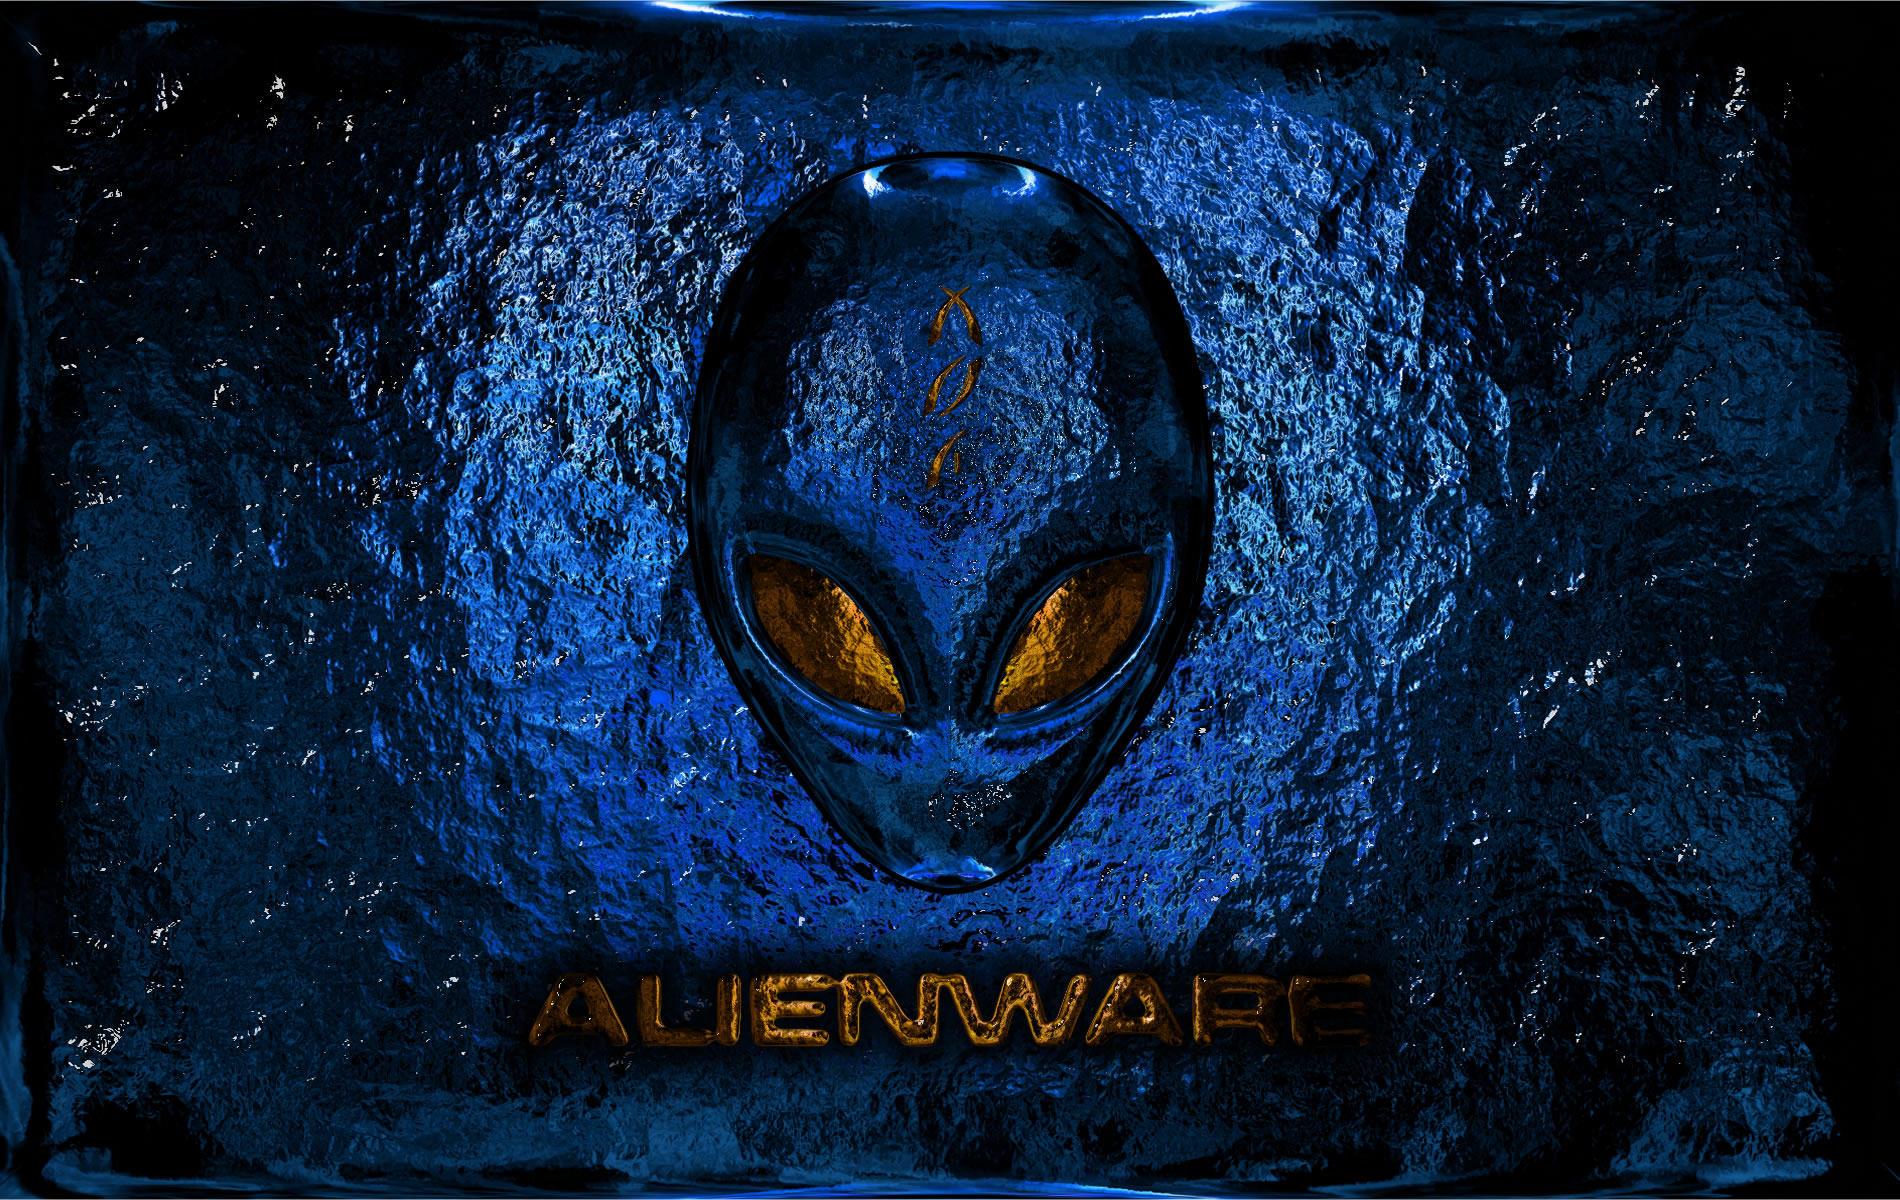 HD Alienware Wallpapers 19201080 Alienware Backgrounds for Laptops 1900x1200